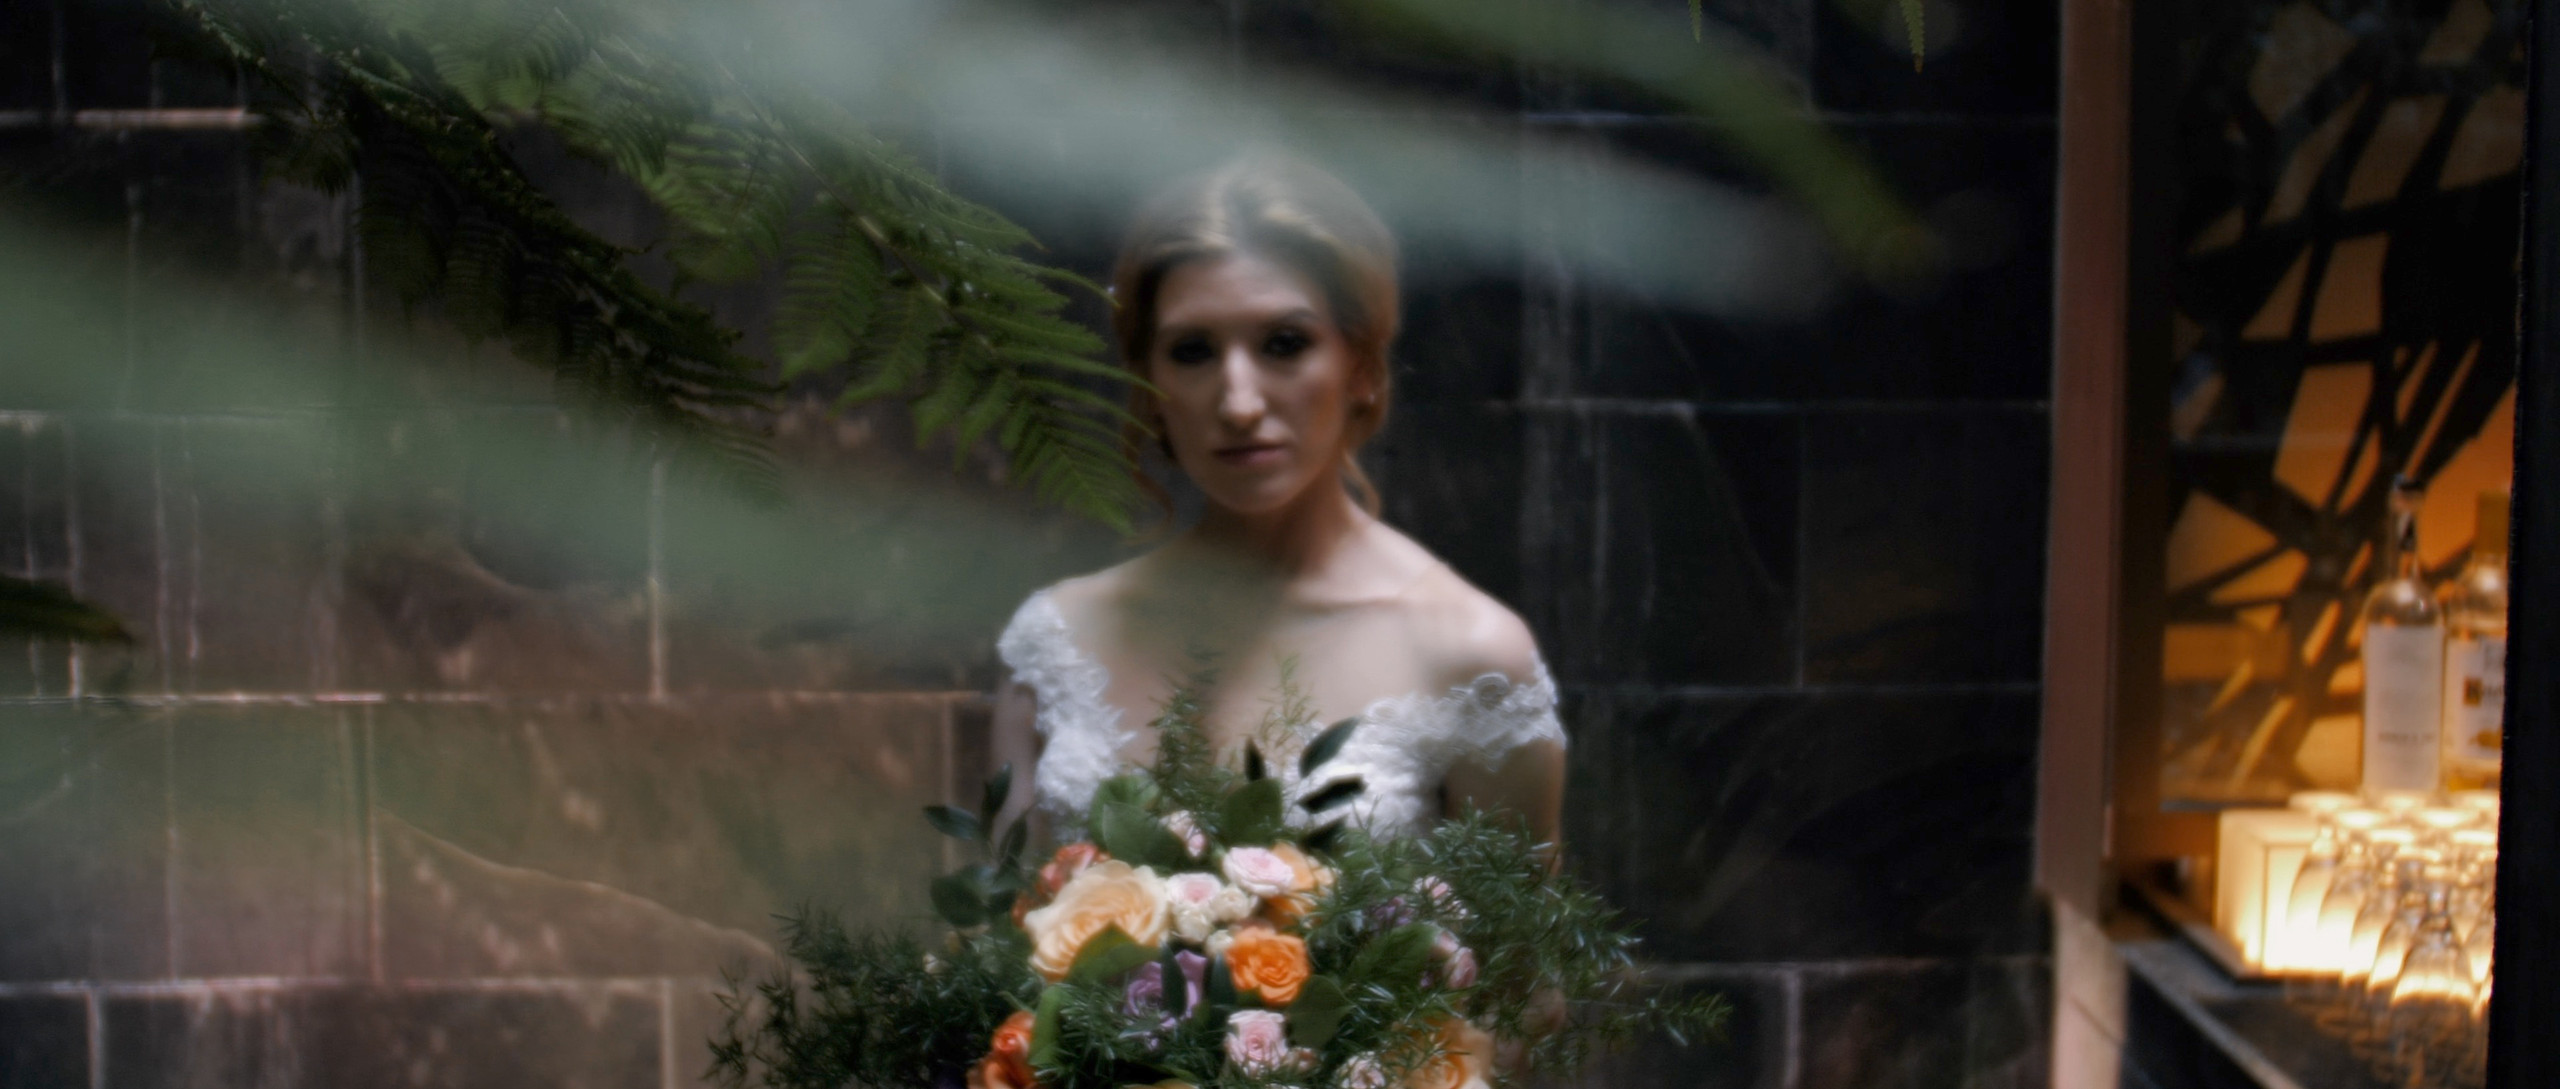 Water fall bride london wedding films videographer